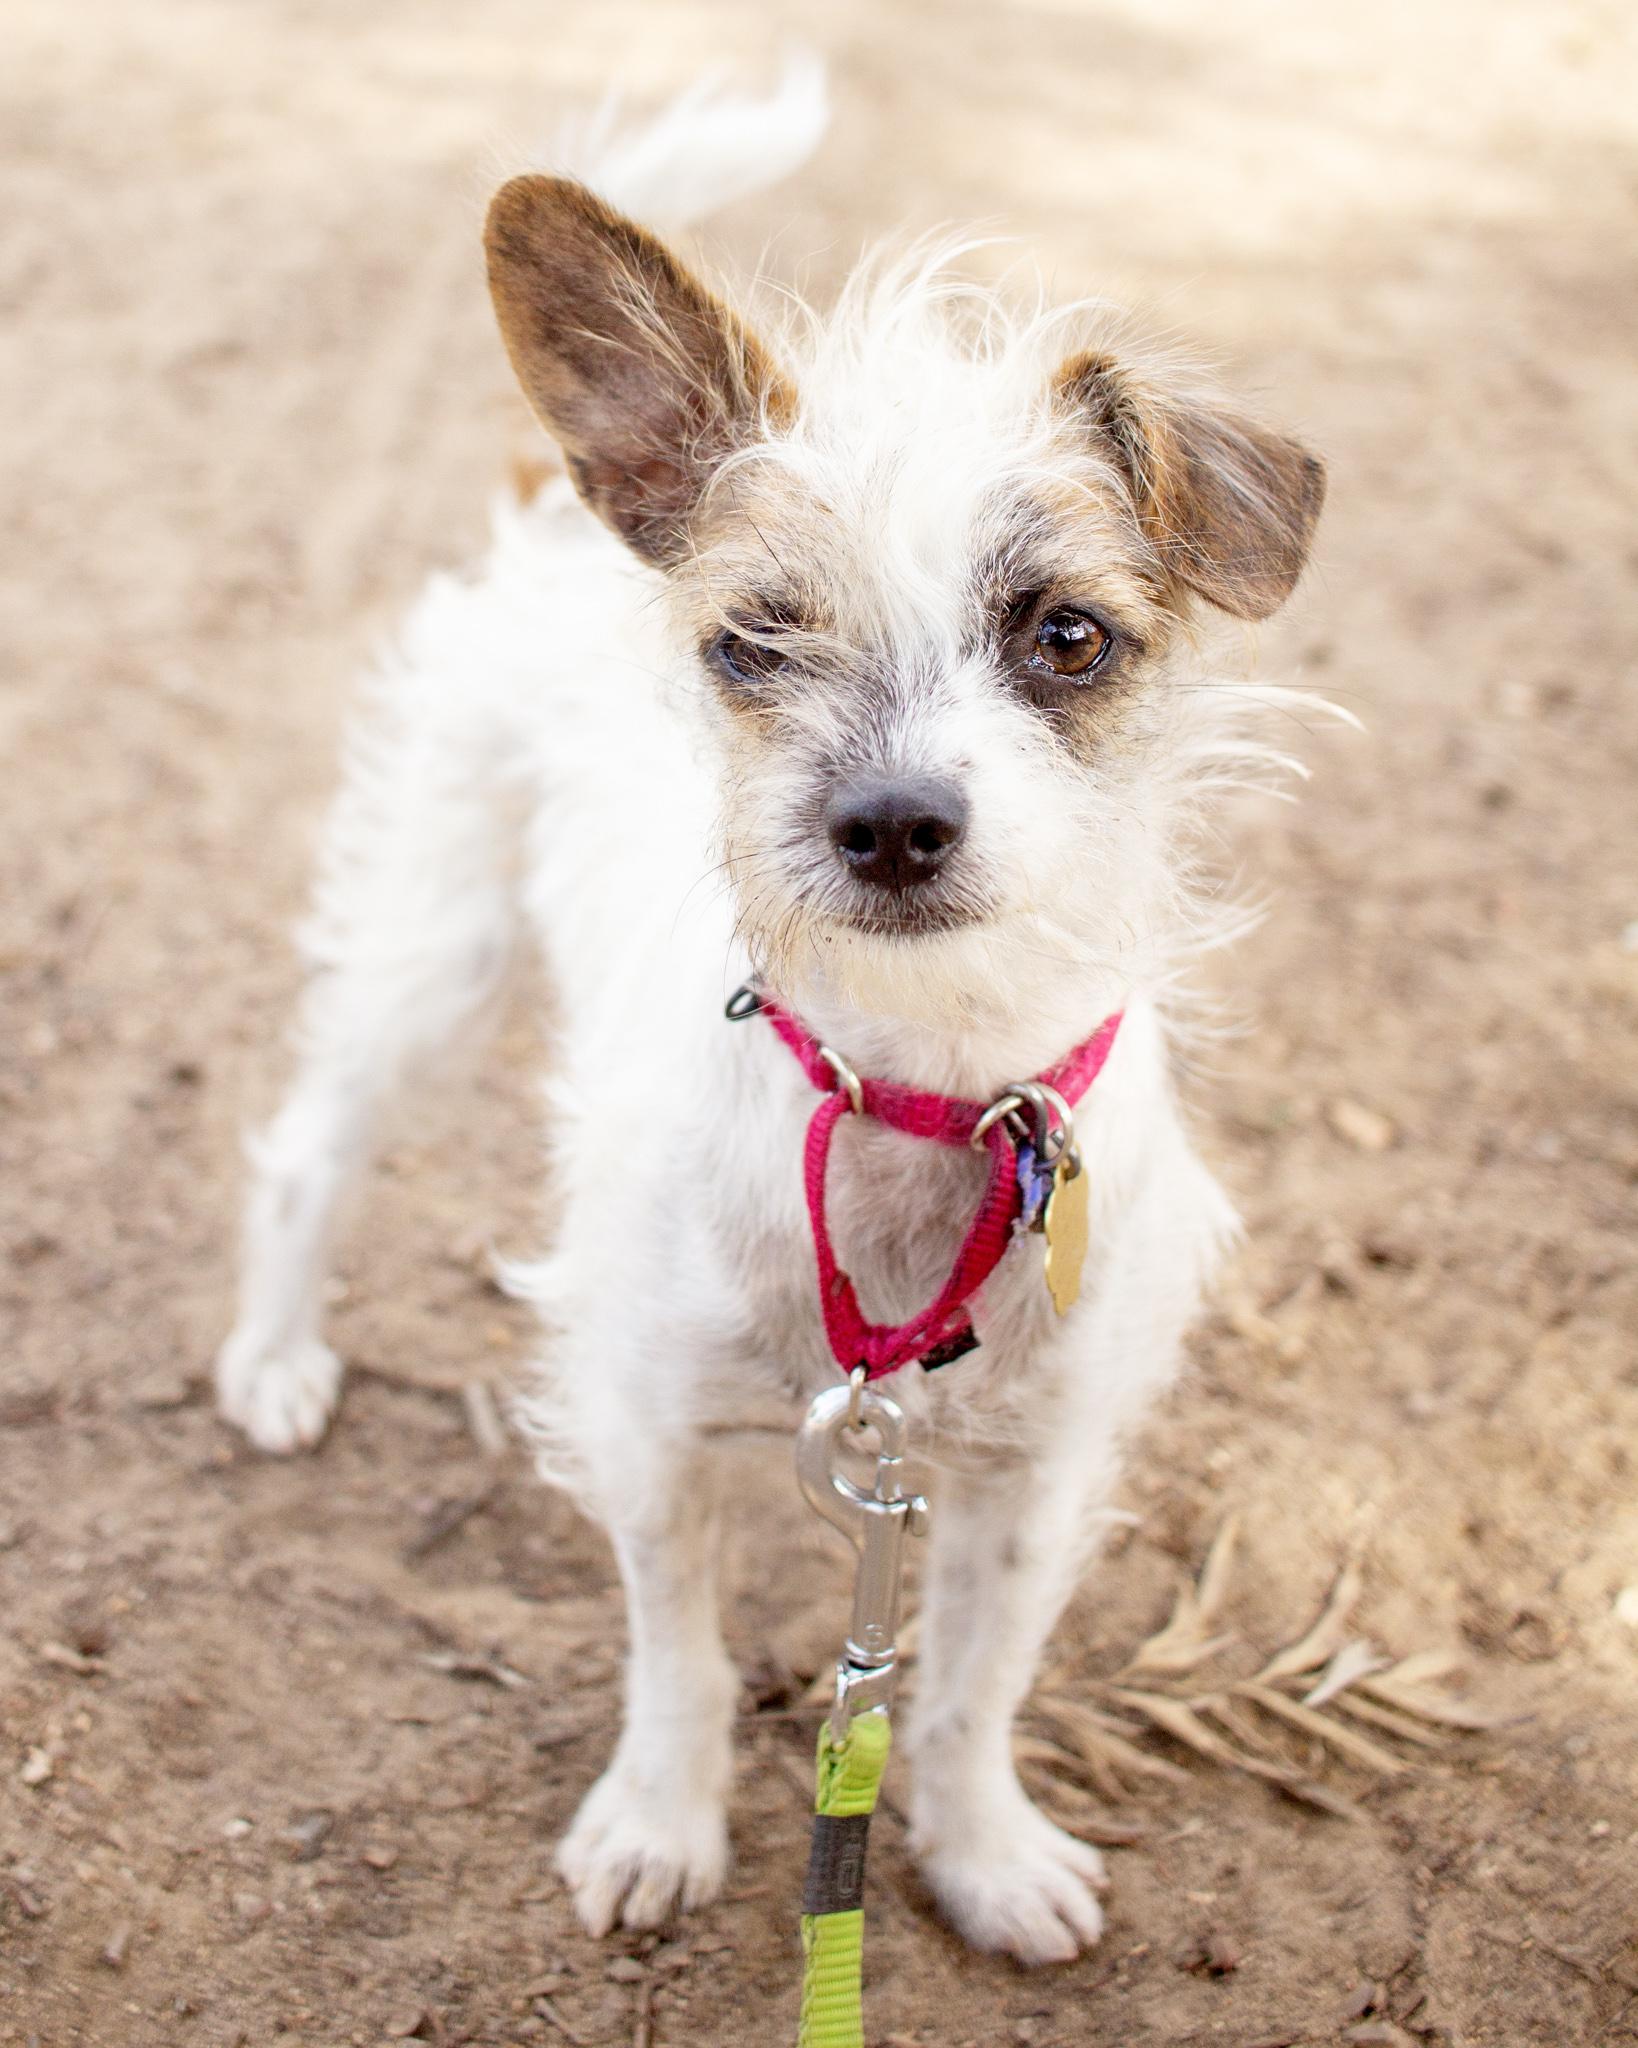 510-Orange-County-Dog-Photography-Steamer-Lee-Southern-California-SBACC.JPG